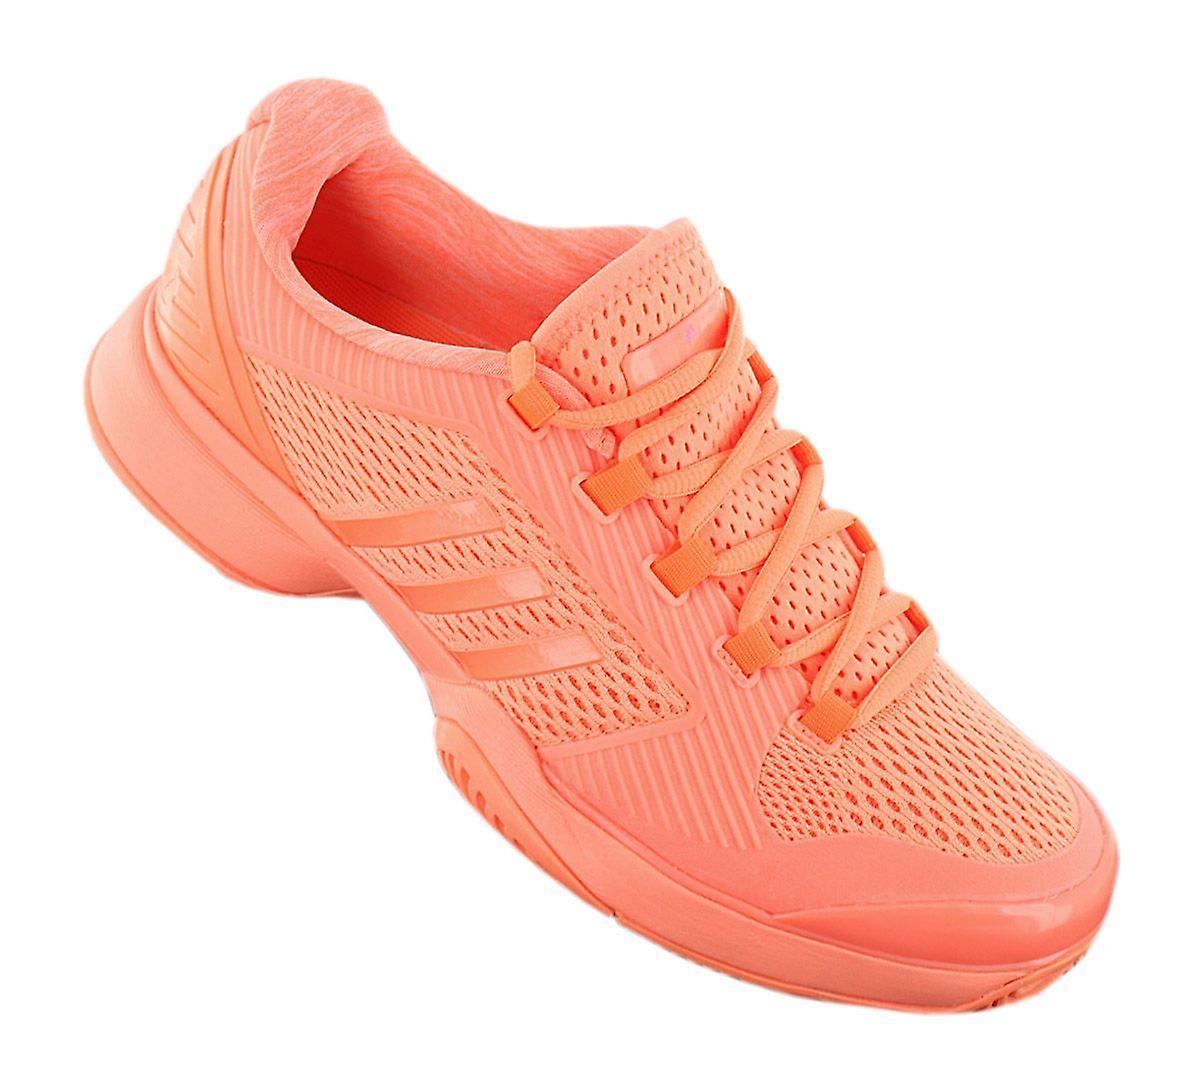 adidas Barricade aSMC - Stella McCartney - Tennisschuhe Orange S78495 Sneakers Sportschuhe rRtFT